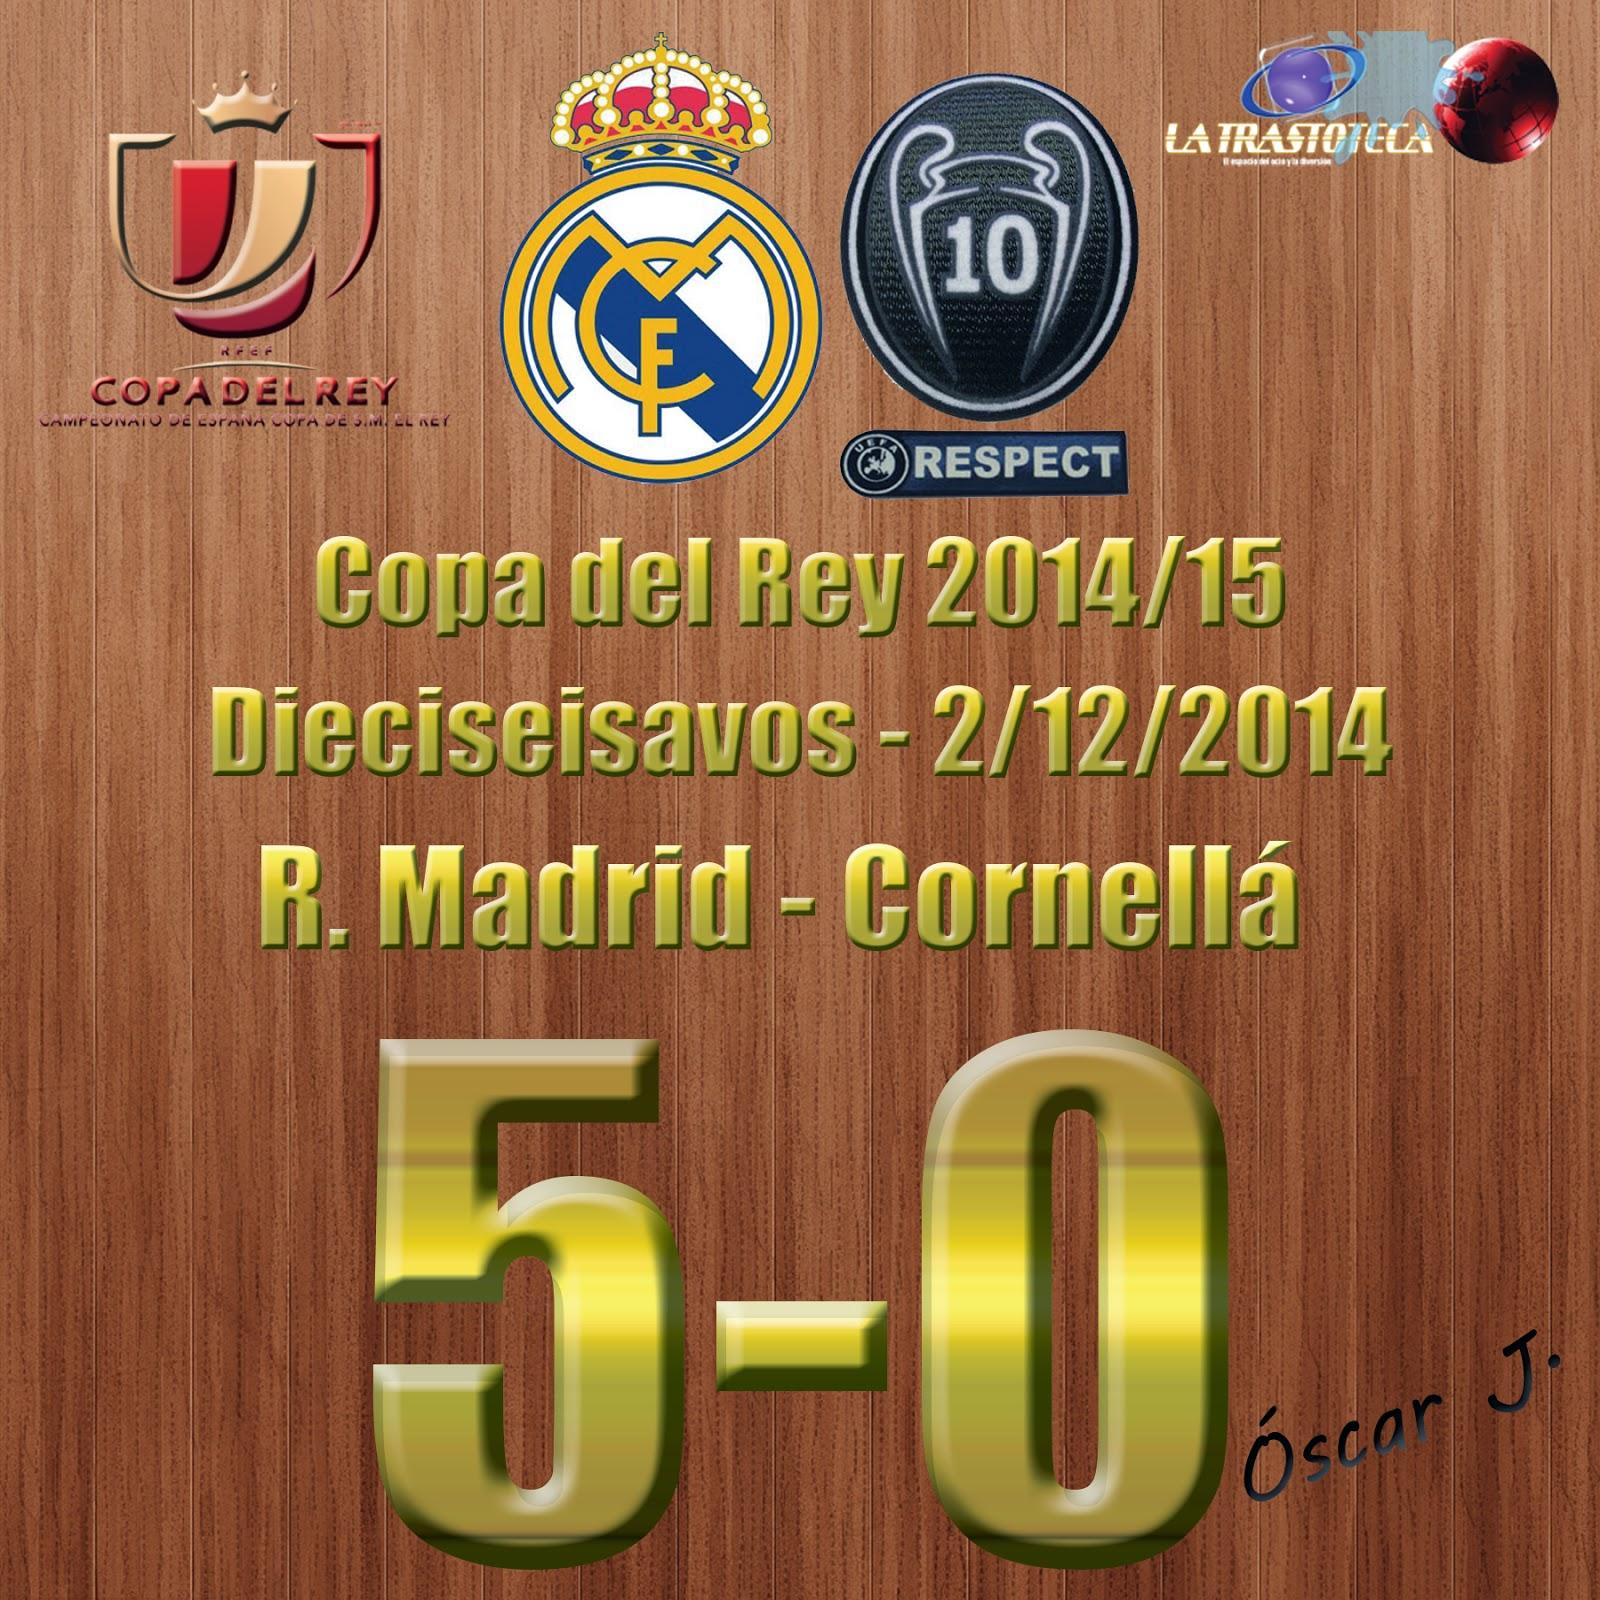 Isco (2-0) - Real Madrid 5-0 Cornellá - Copa del Rey 2014/15 - Dieciseisavos - (2/12/2014)